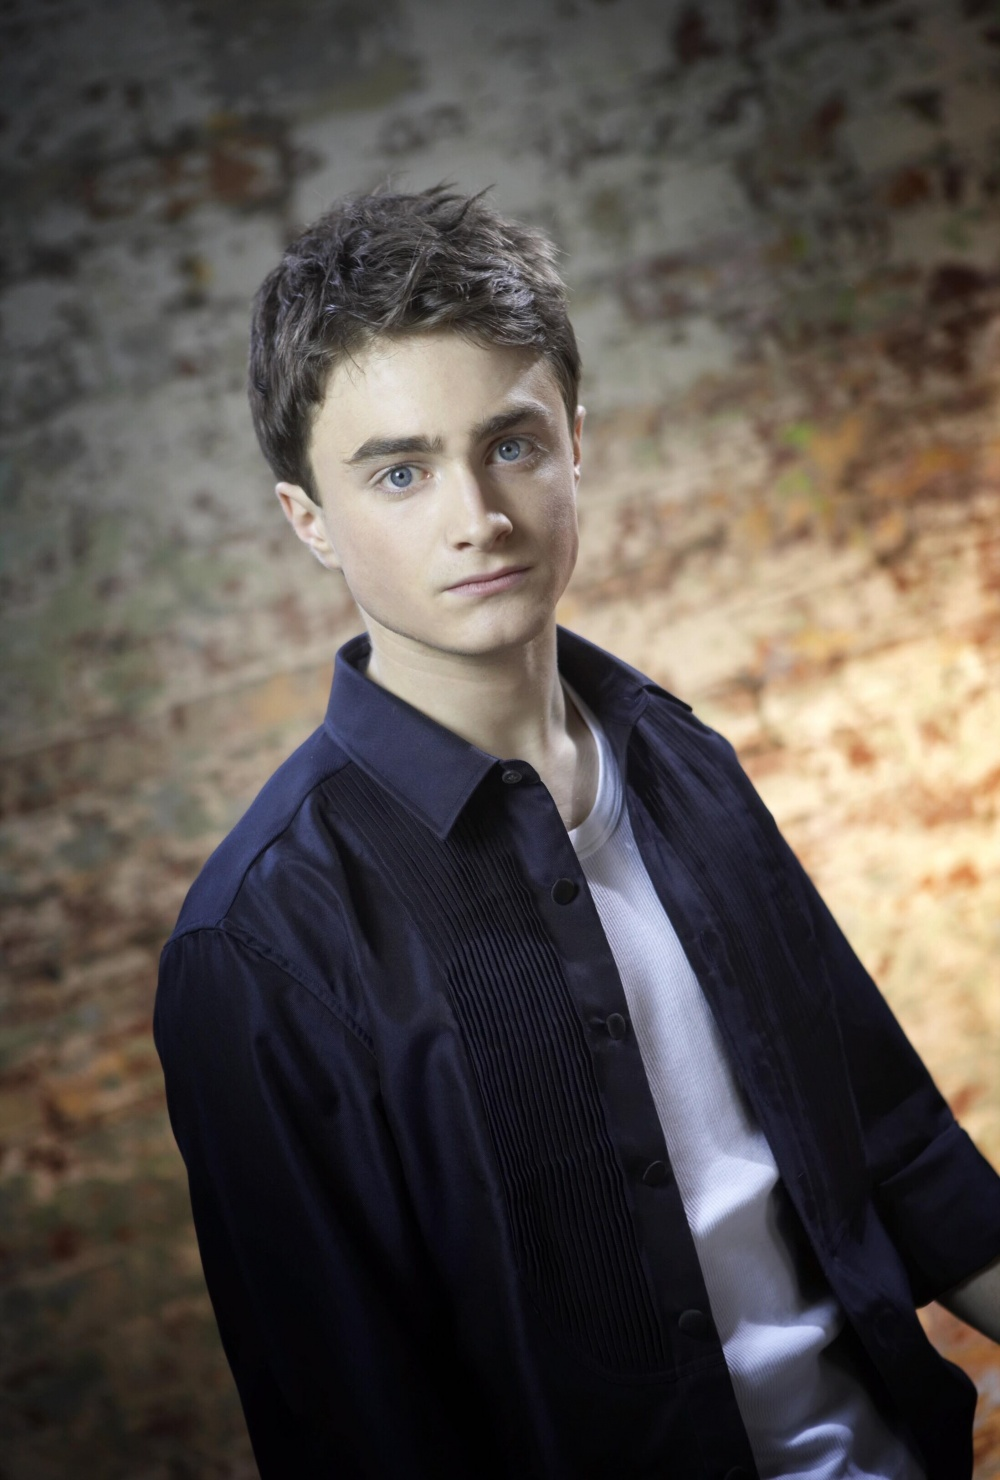 Дэниел Редклифф (Daniel Radcliffe)